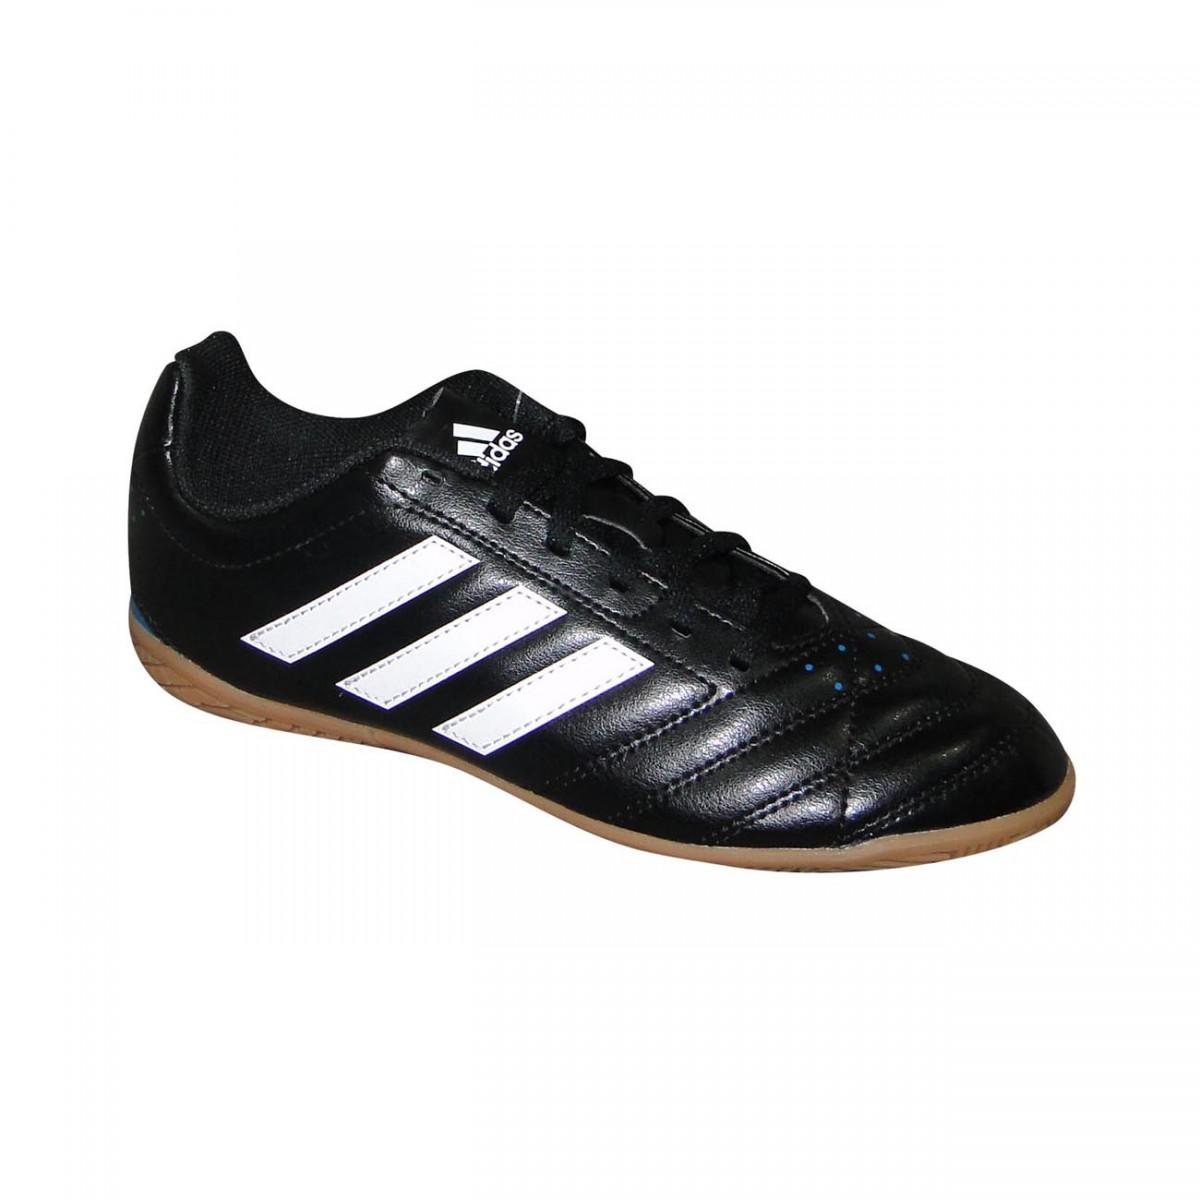 Tenis Adidas Goletto V Infantil B26186 - Preto Branco - Chuteira Nike 7d250752d7289